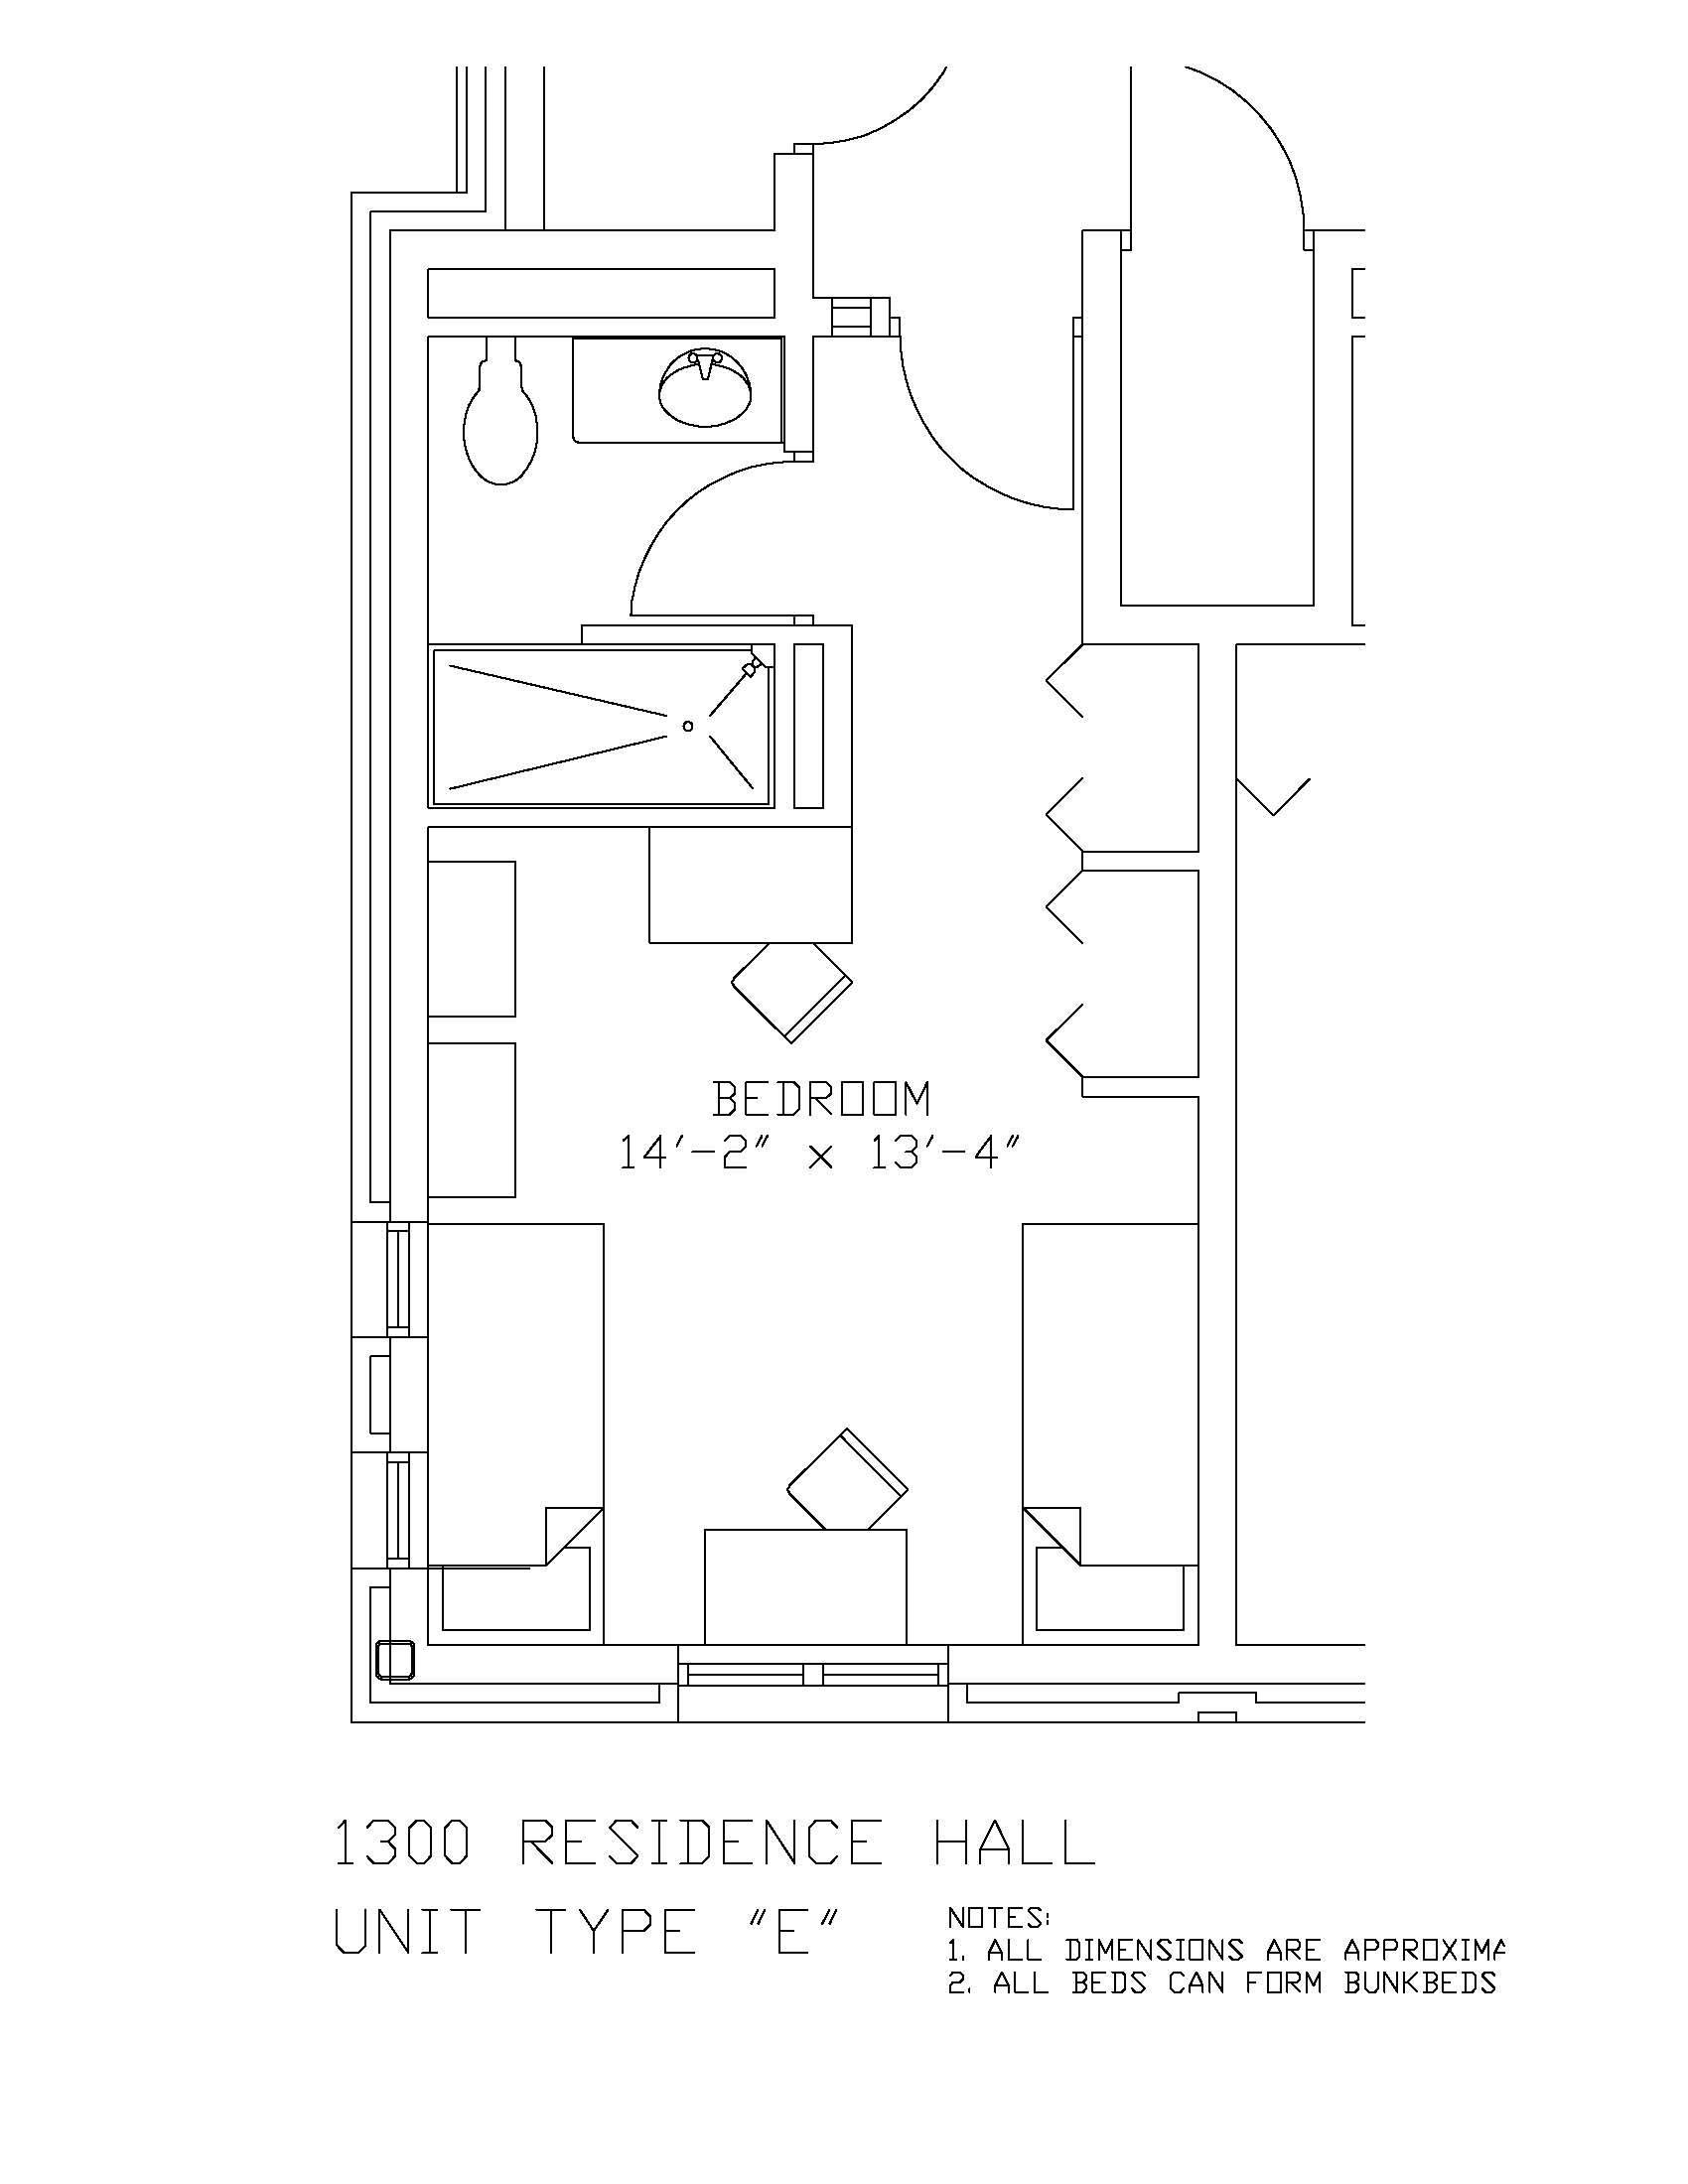 1300 Residence Hall: Type E